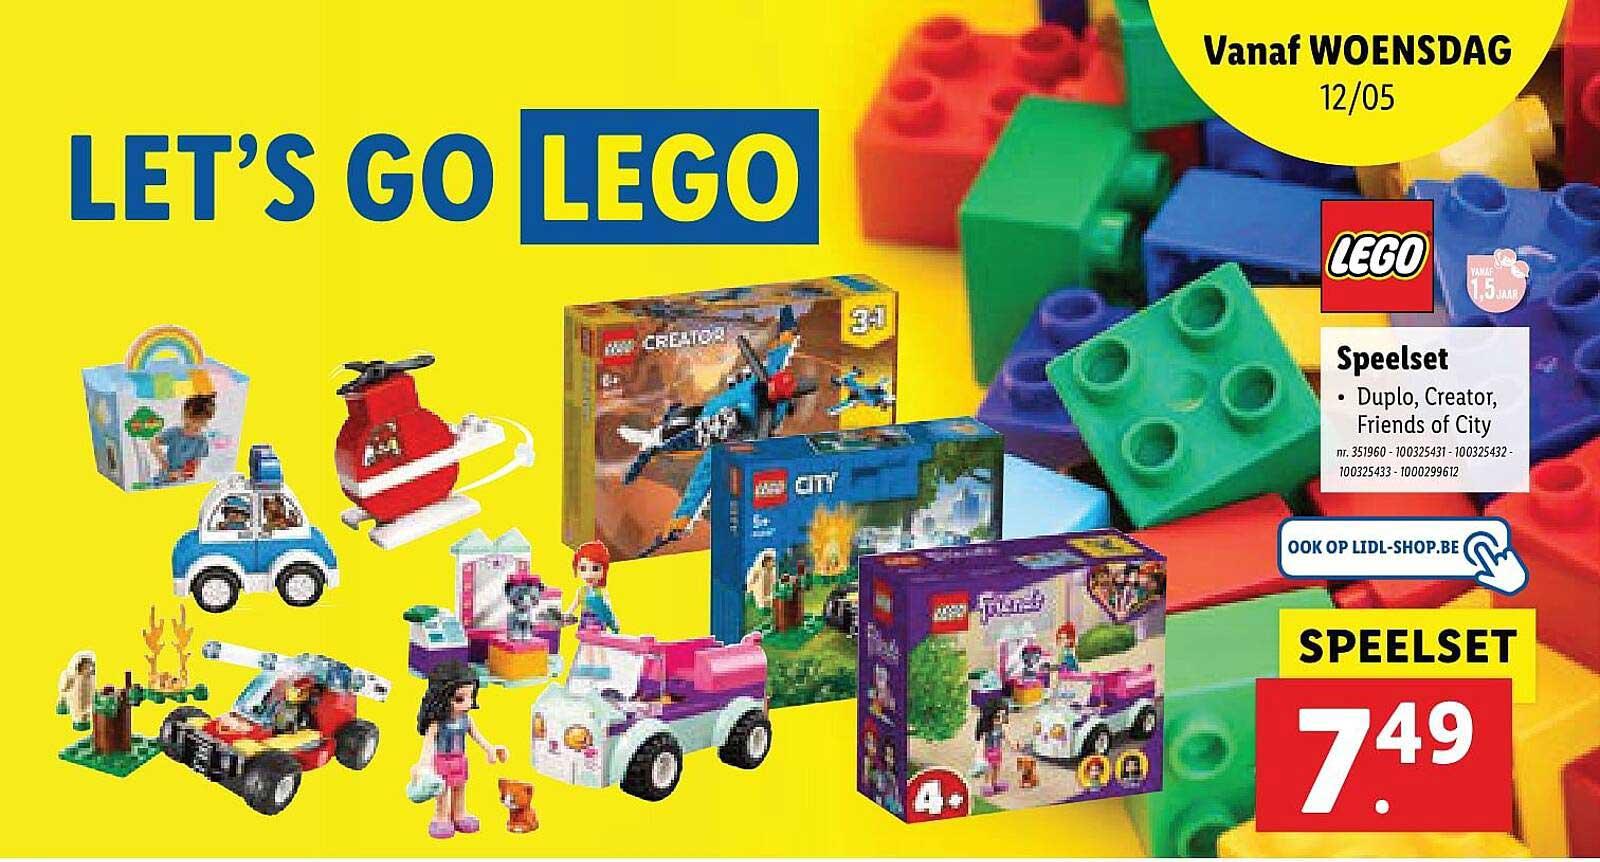 Lidl Lego Speelset Duplo, Creator, Friends Of City